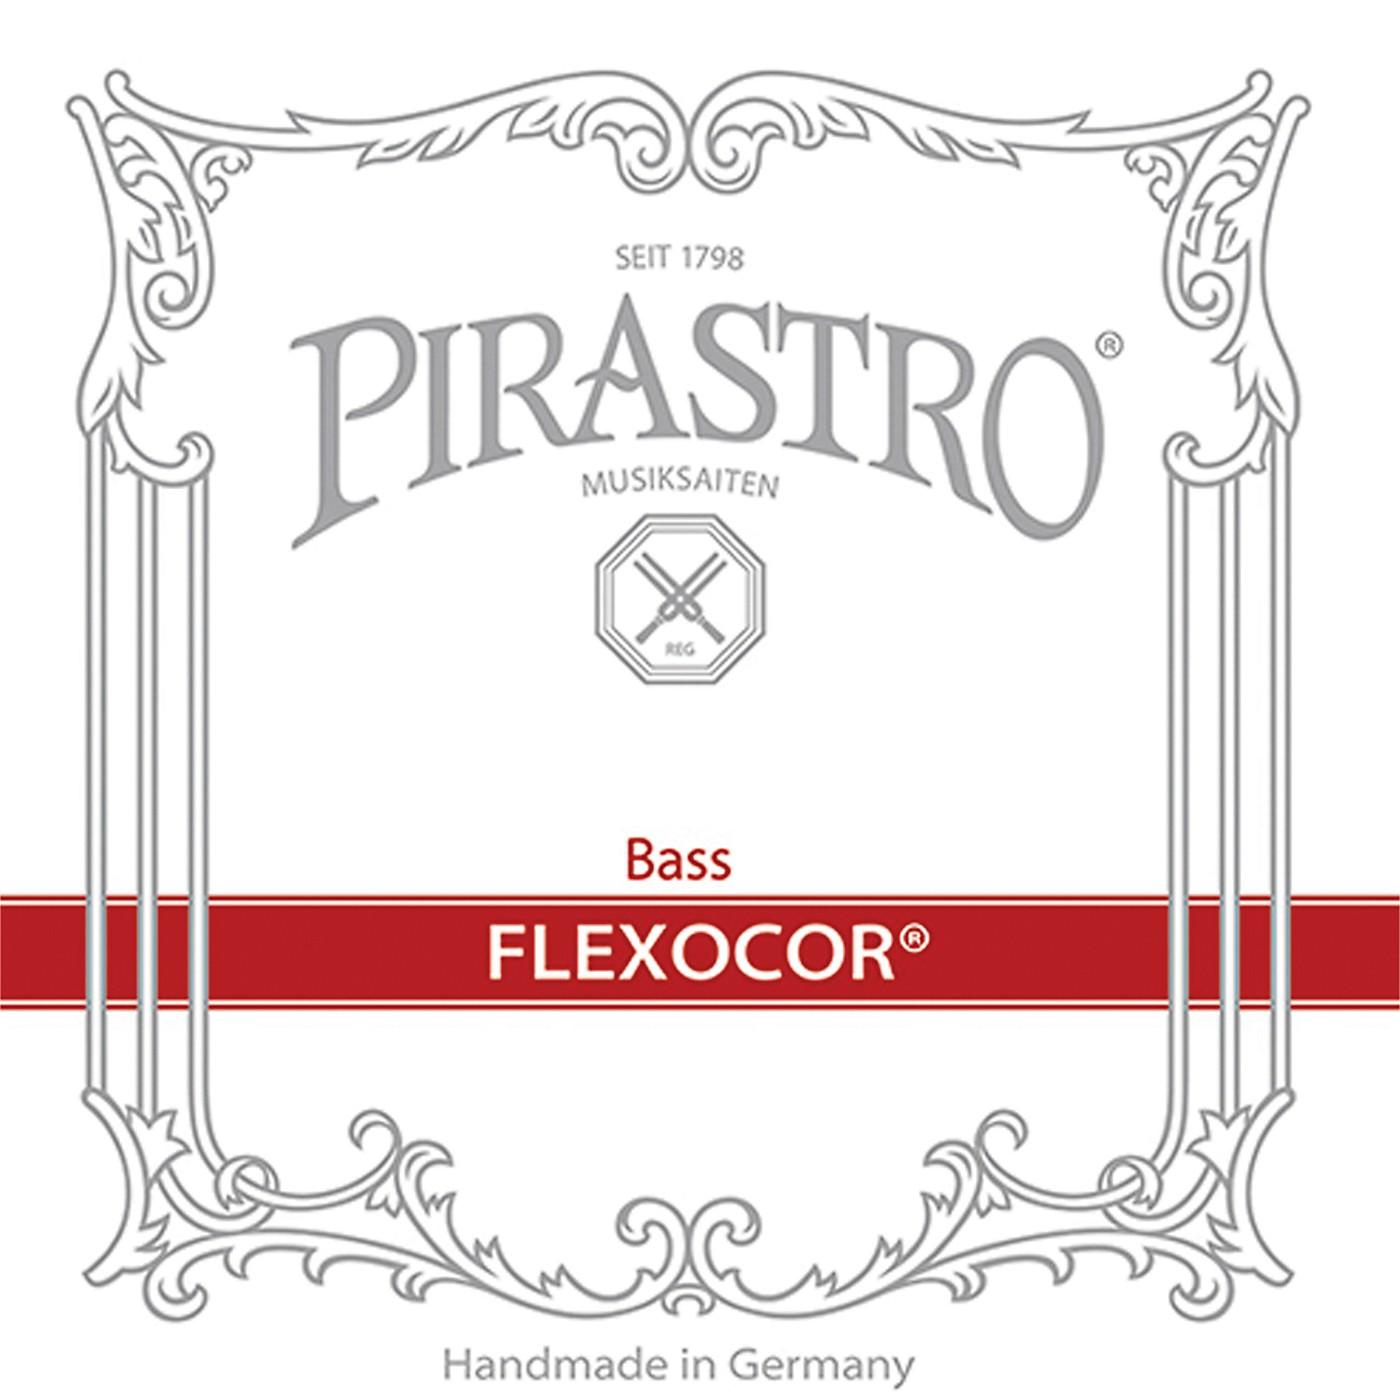 Pirastro Flexocor Series Double Bass G String thumbnail